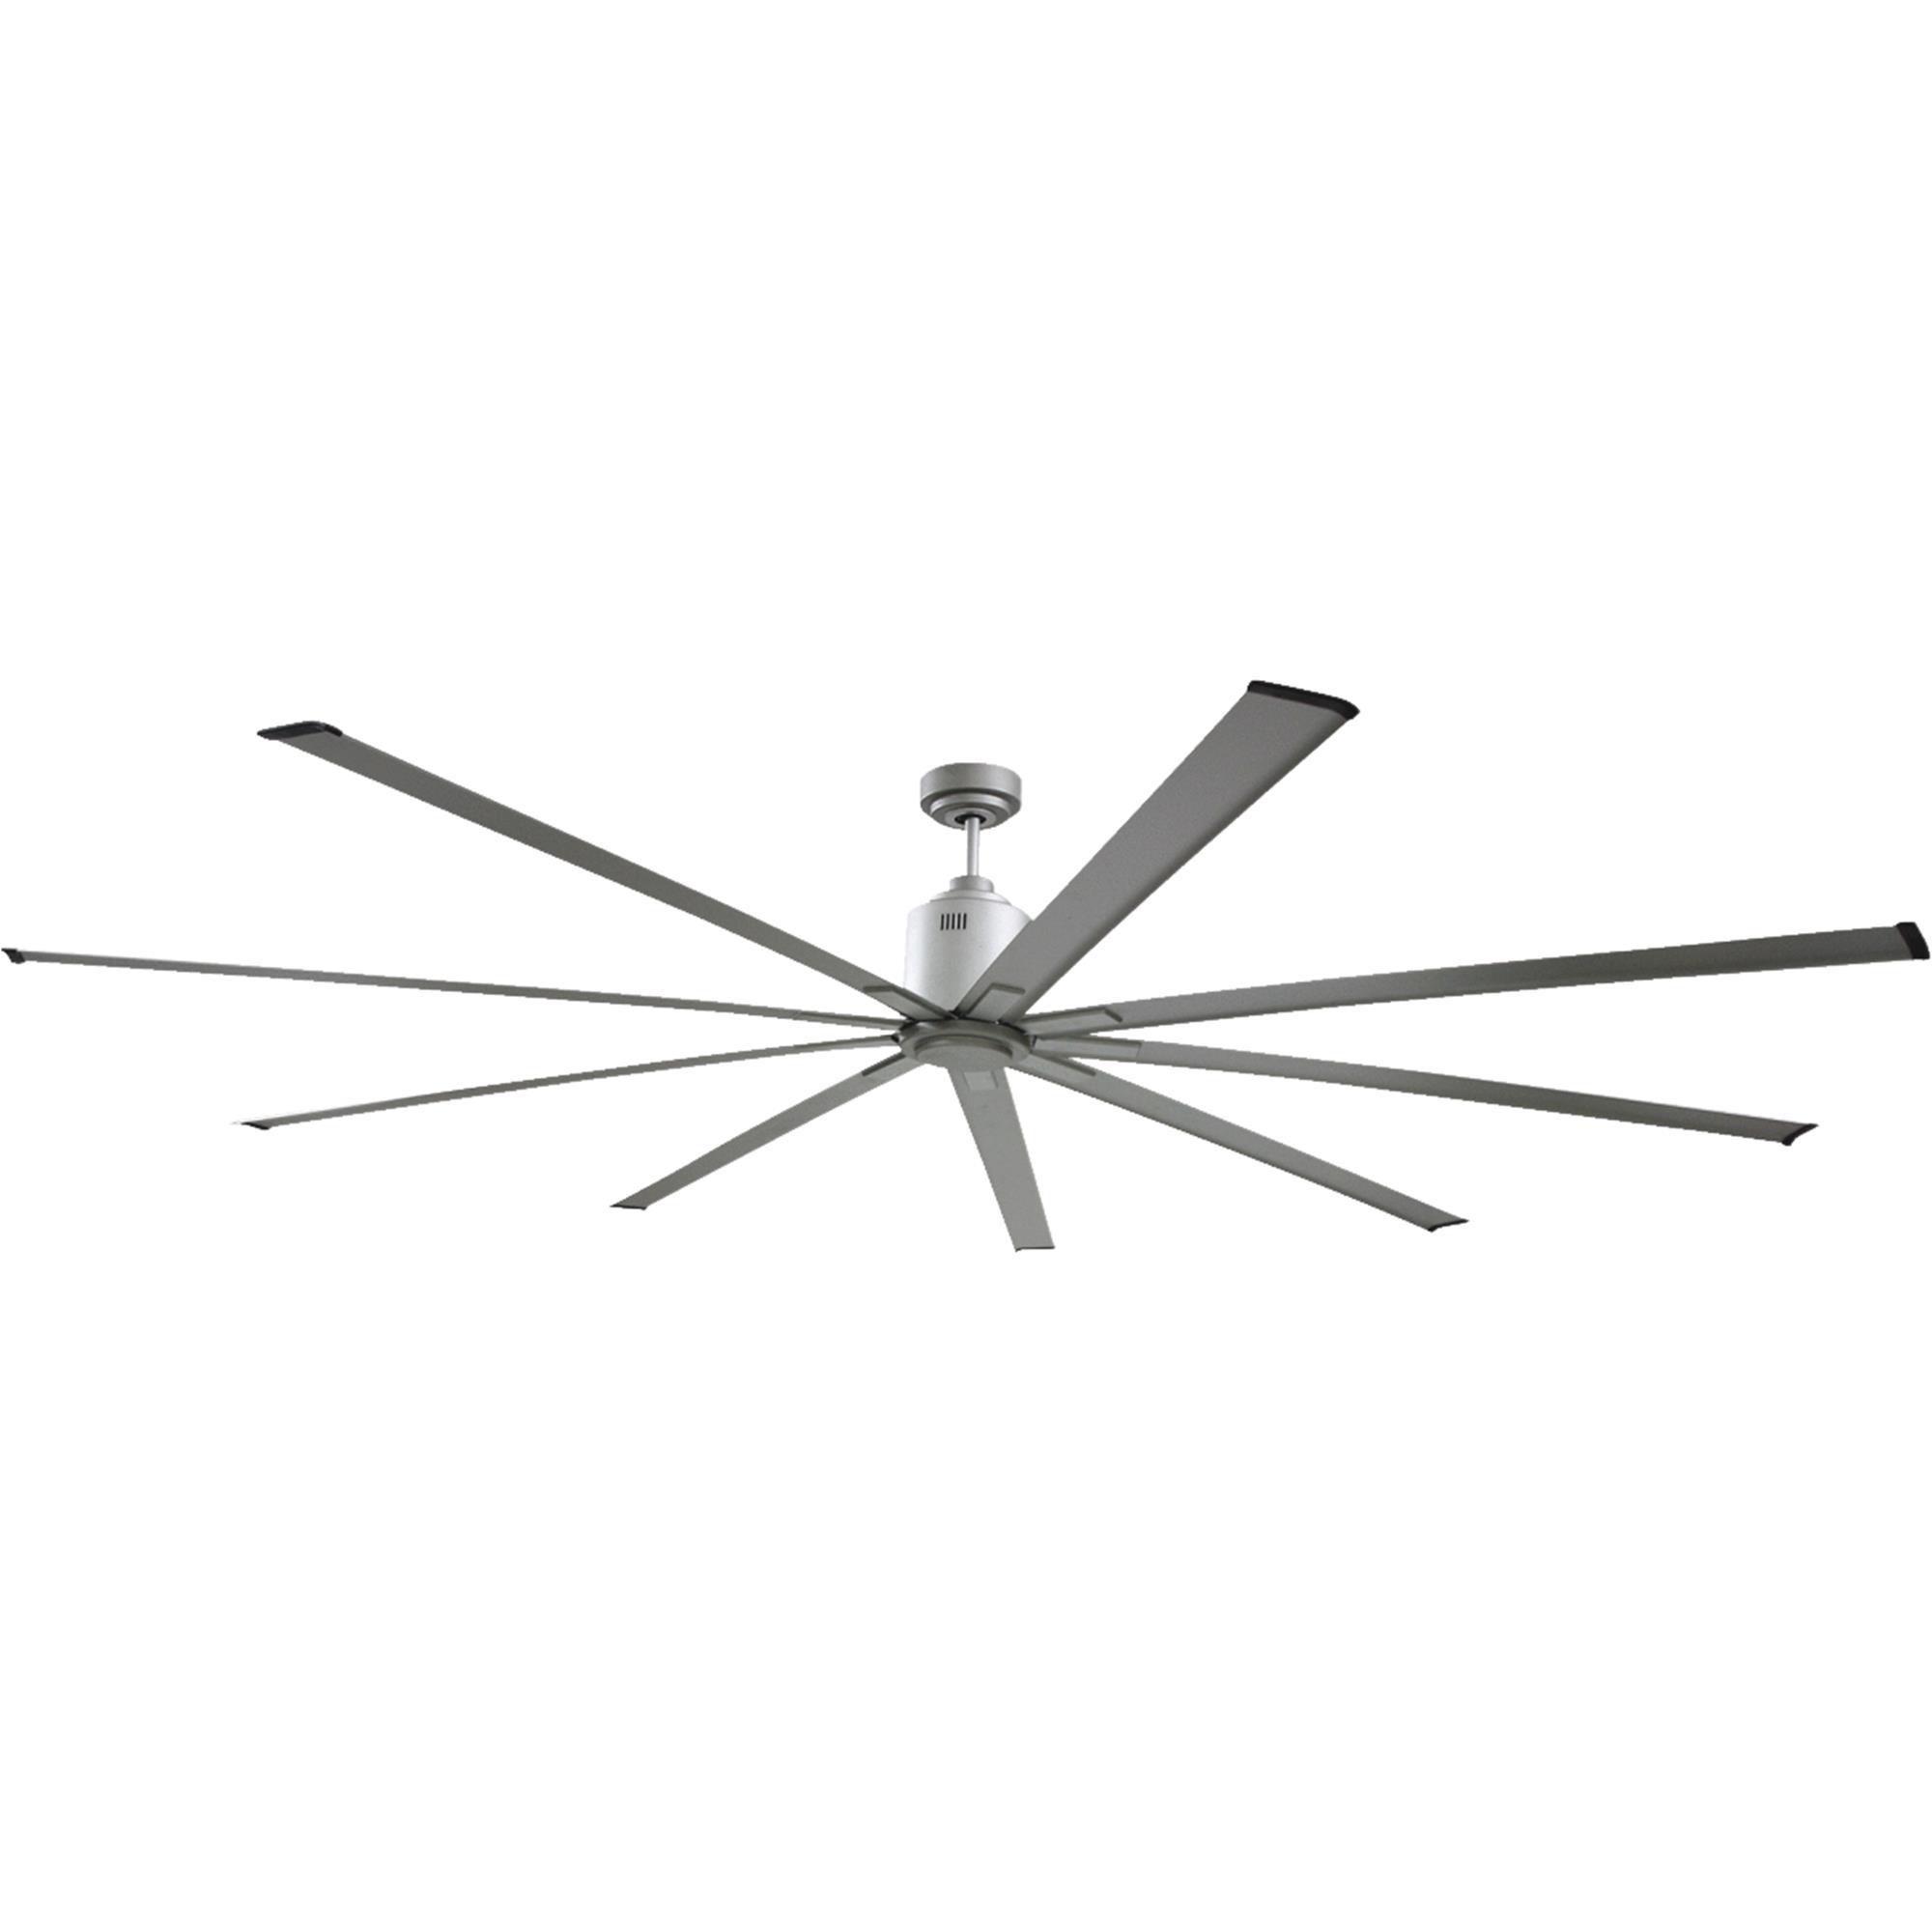 Ventamatic Big Air Industrial Ceiling Fan